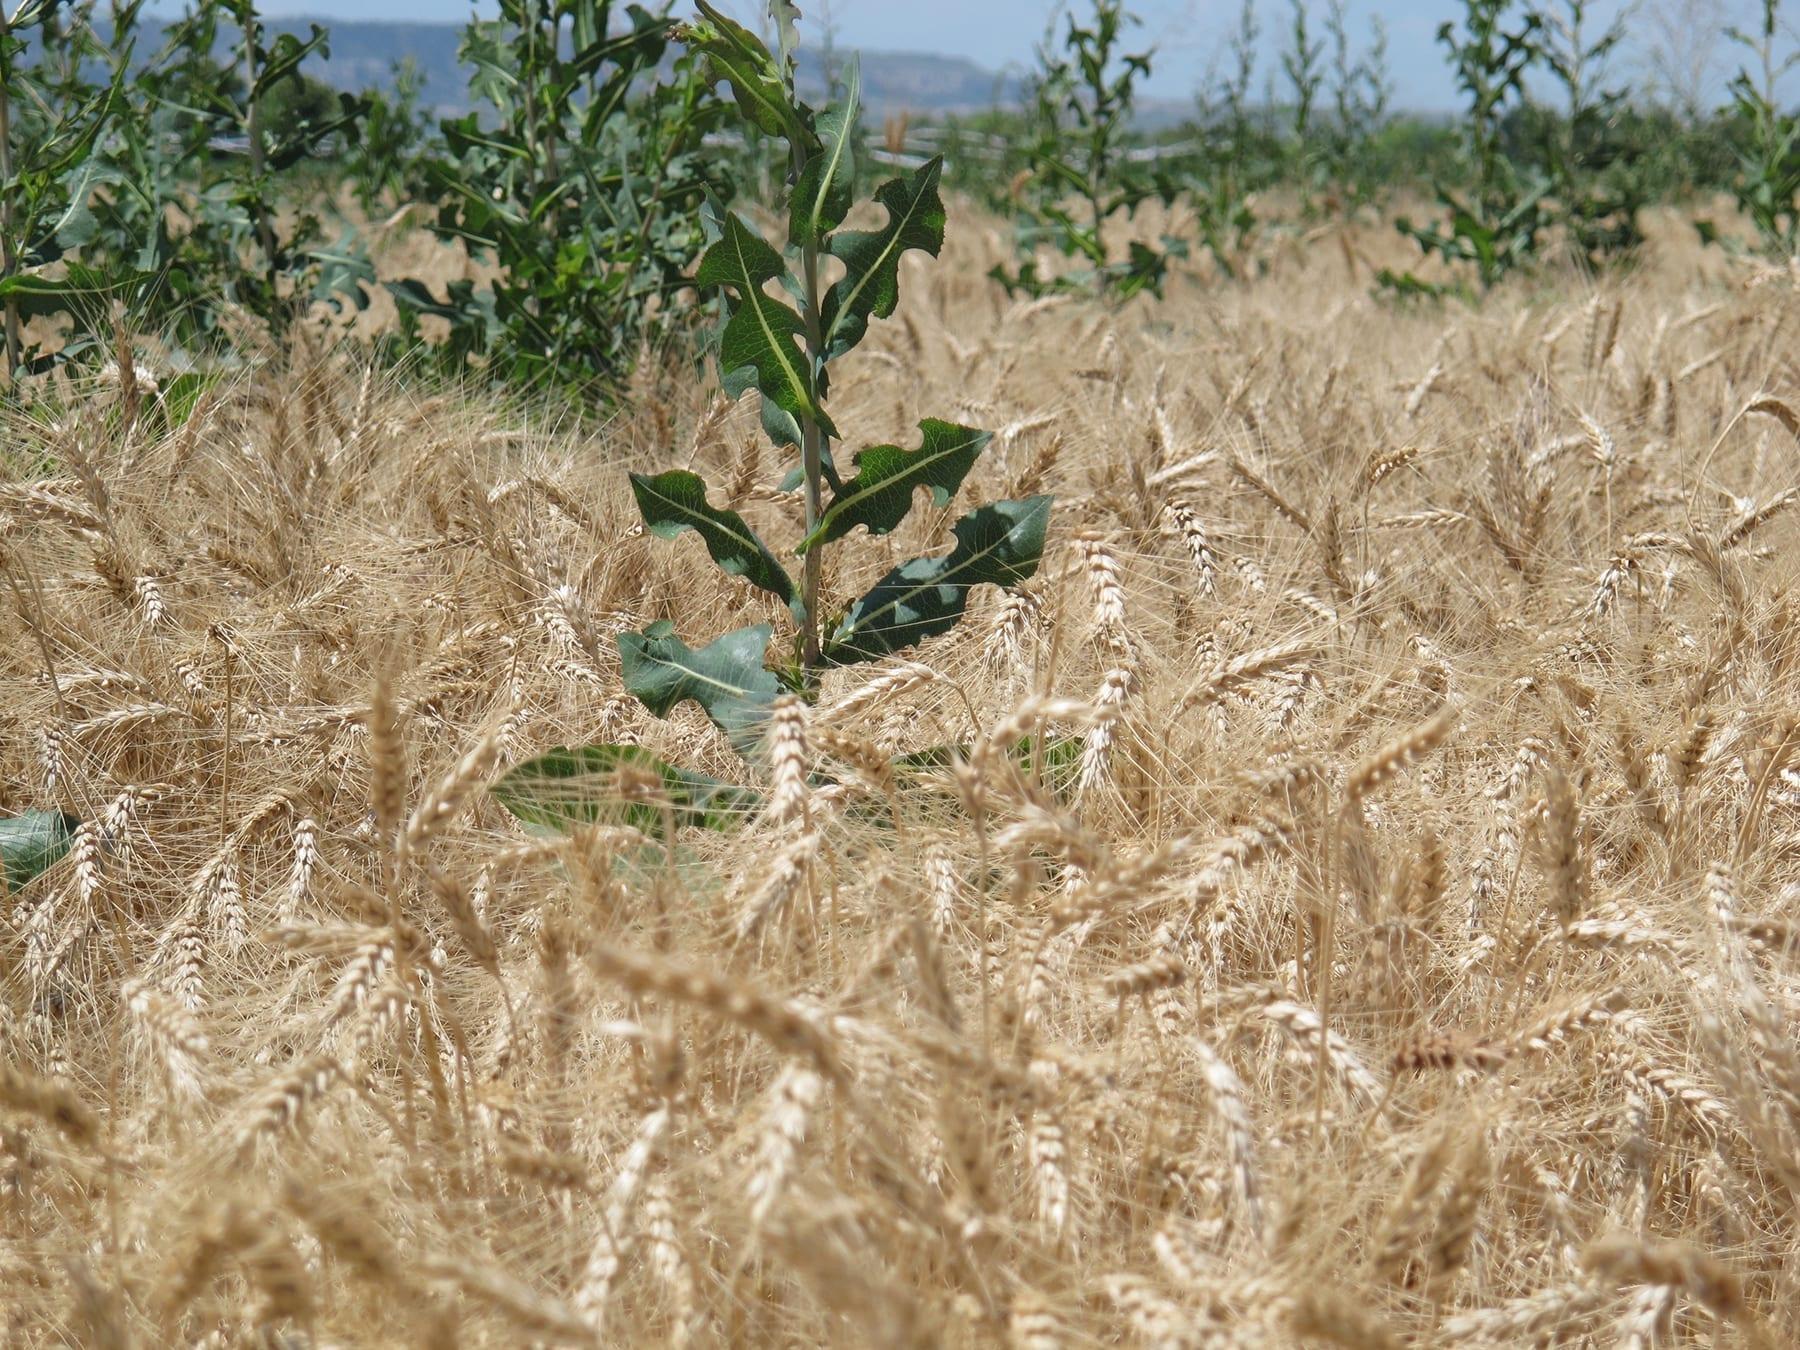 Aké je ideálne zastúpenie pšenice v osevnom postupe?